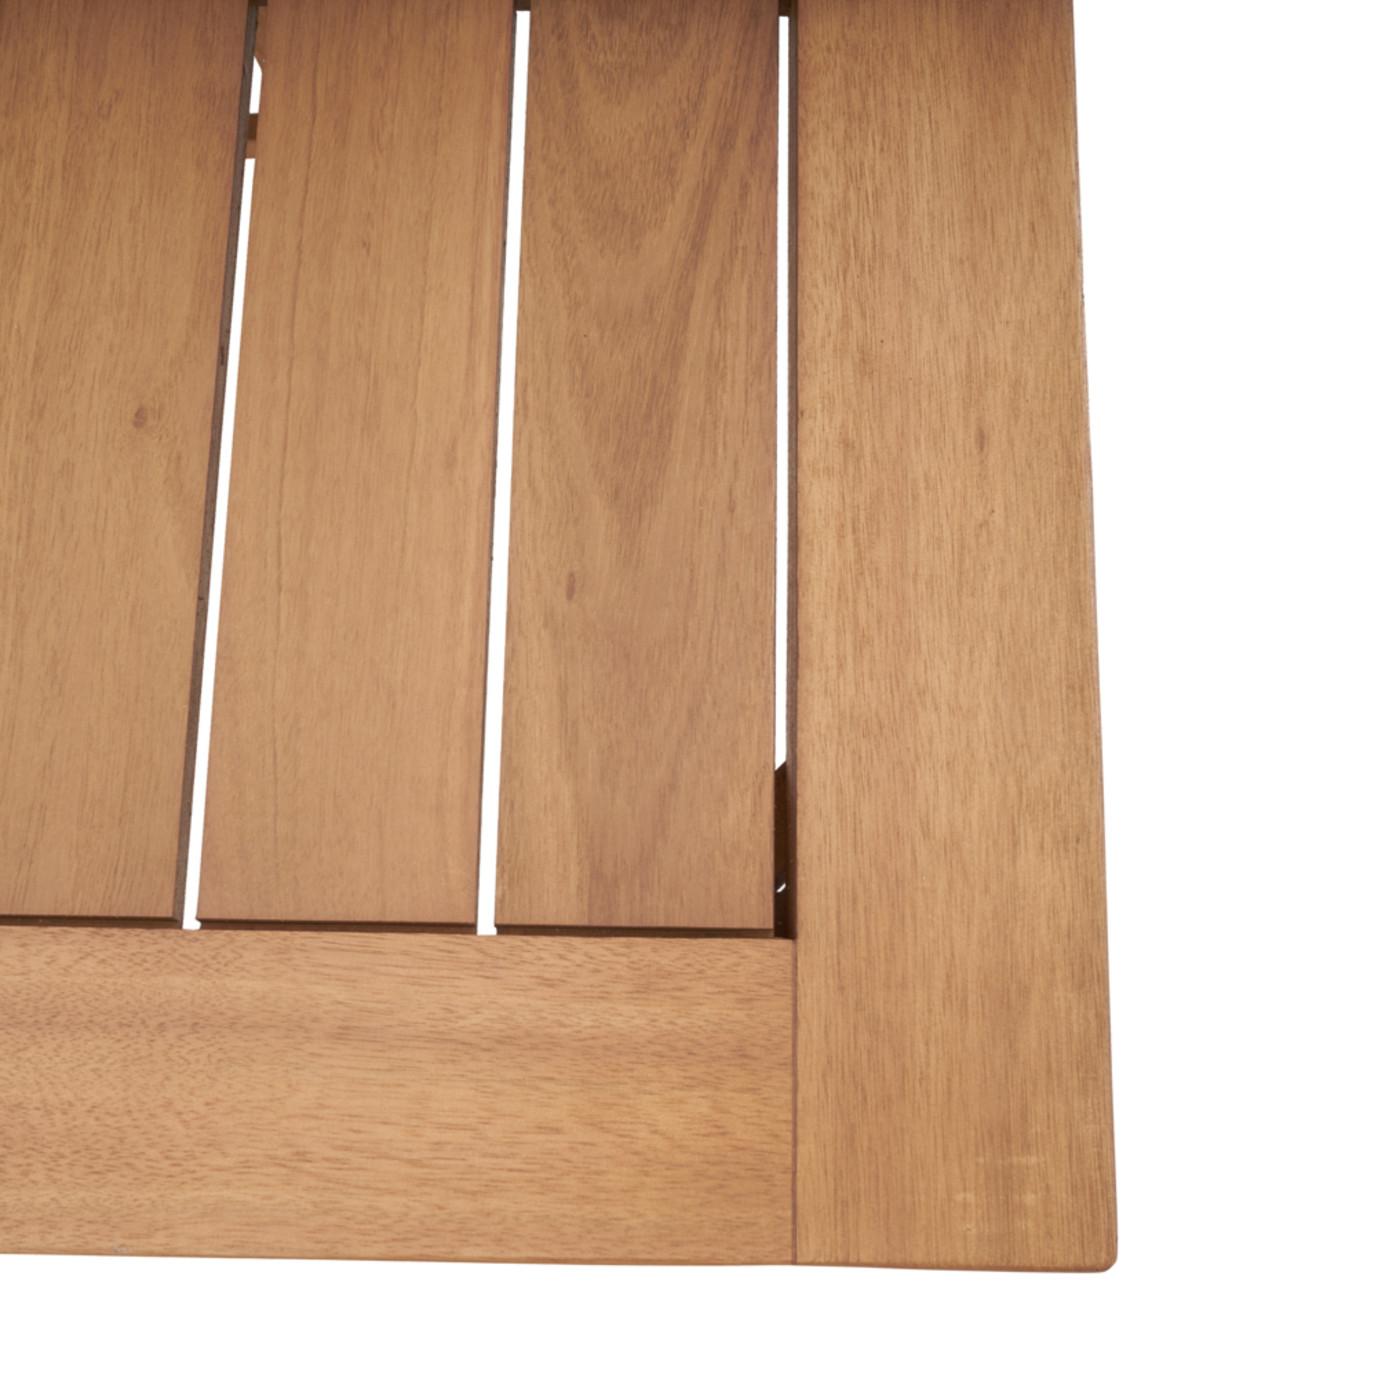 Norwell 5pc Bar Set